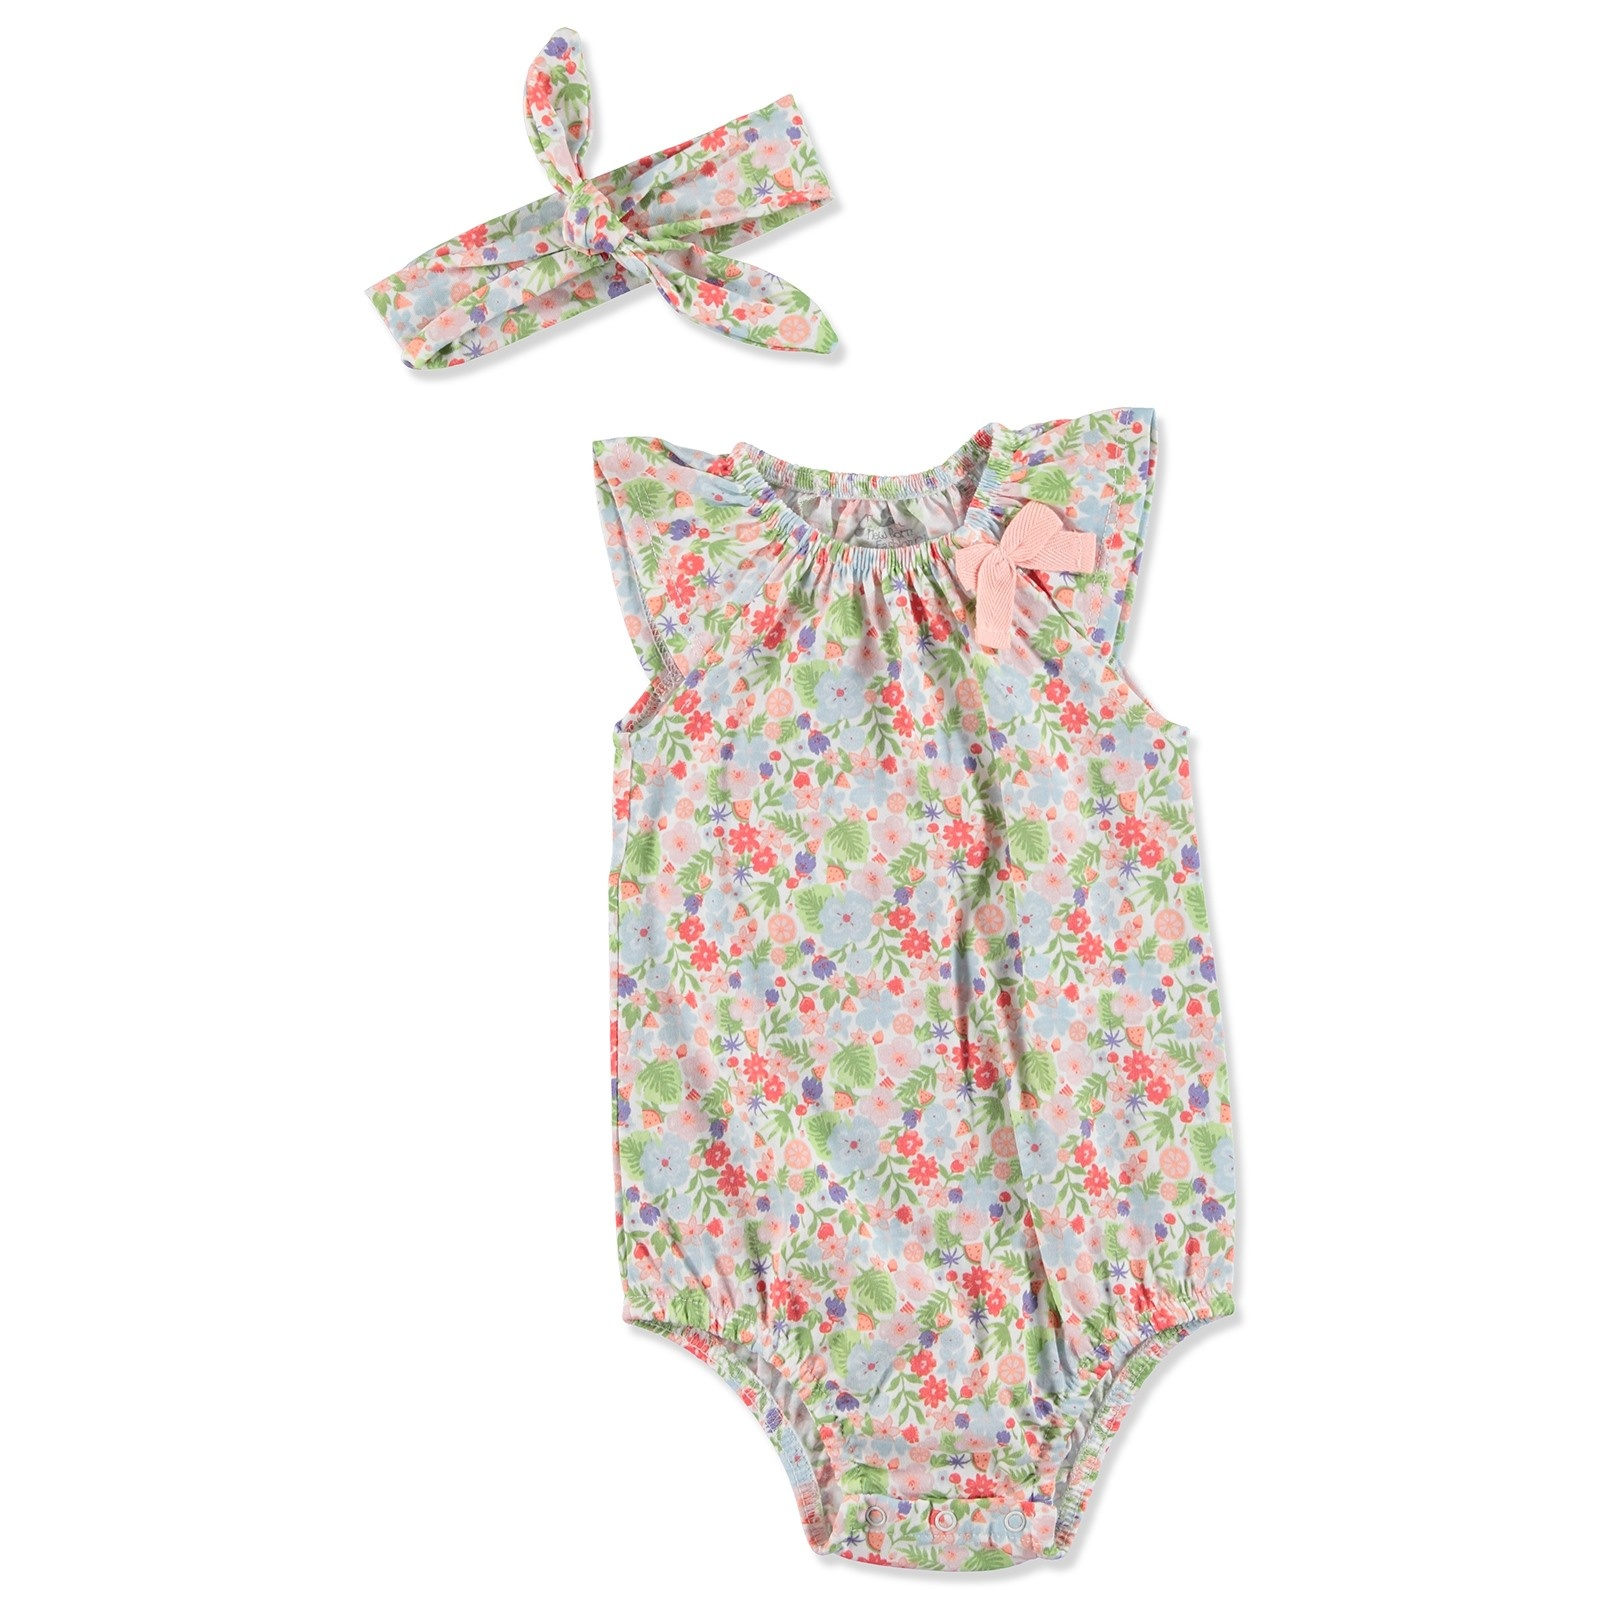 Ebebek Newborn Fashion Club Tropical Summer Baby Girl Bodysuit Hairband